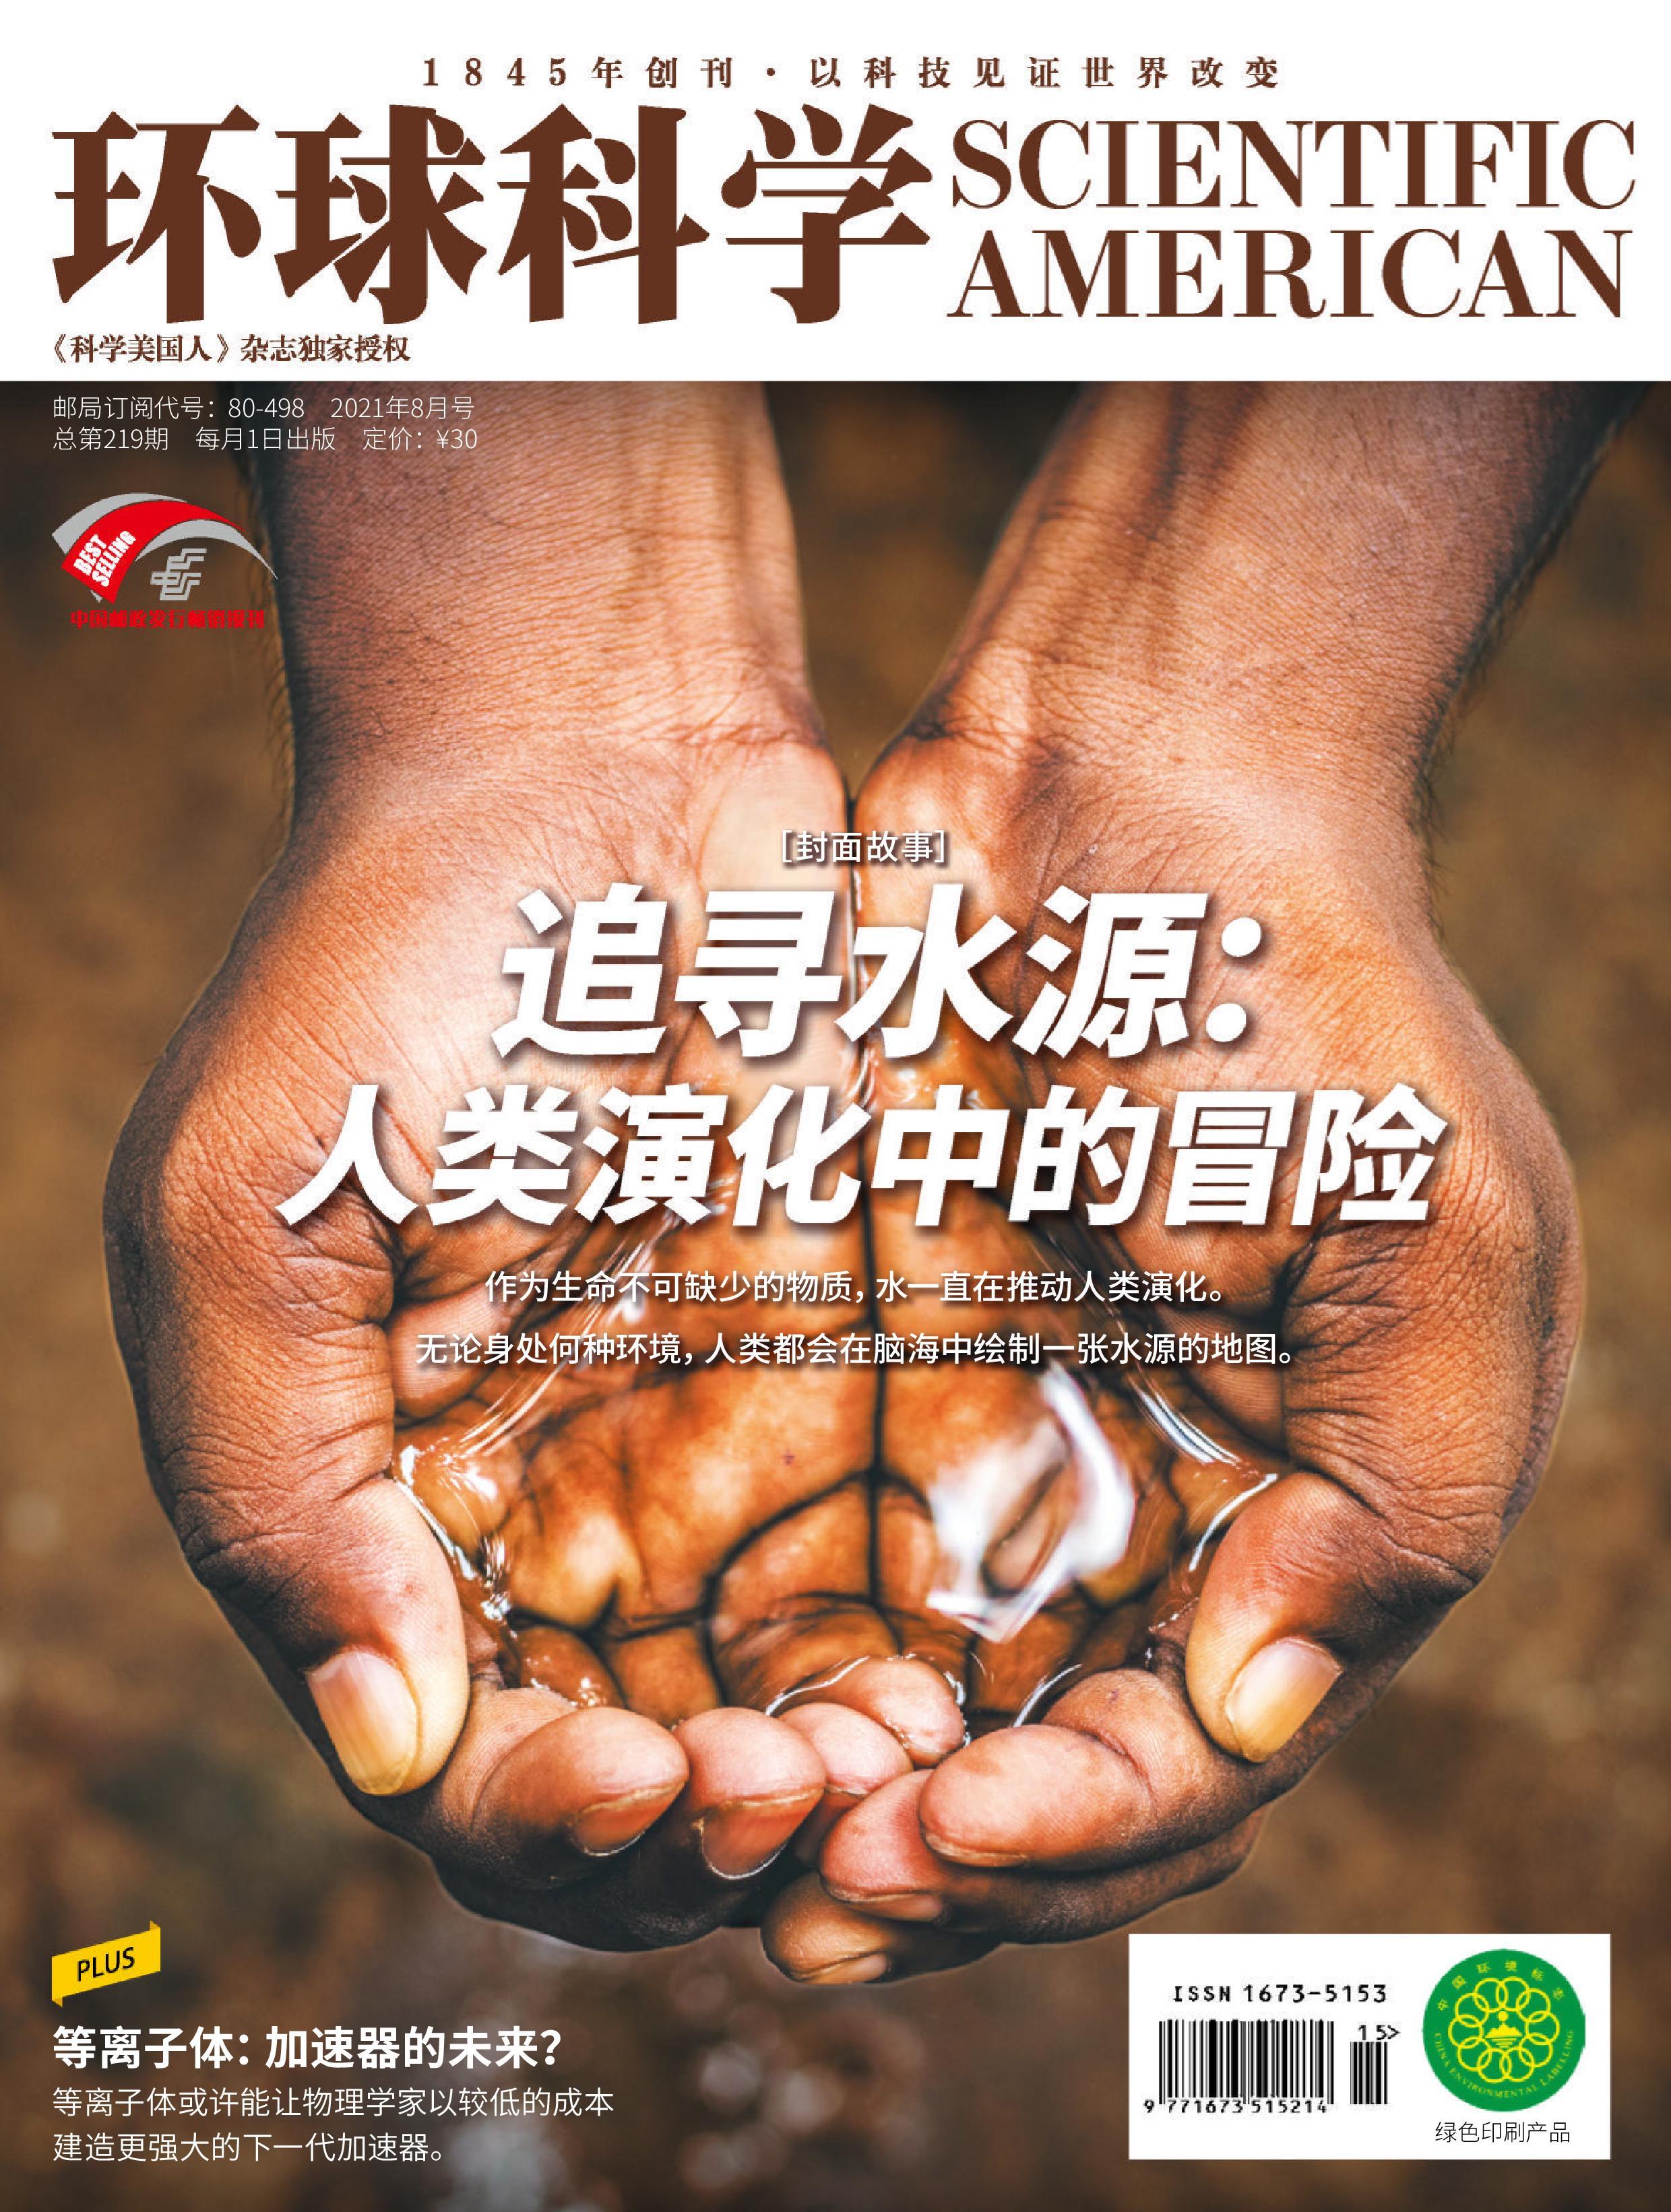 Scientific American Chinese Edition - 八月 2021